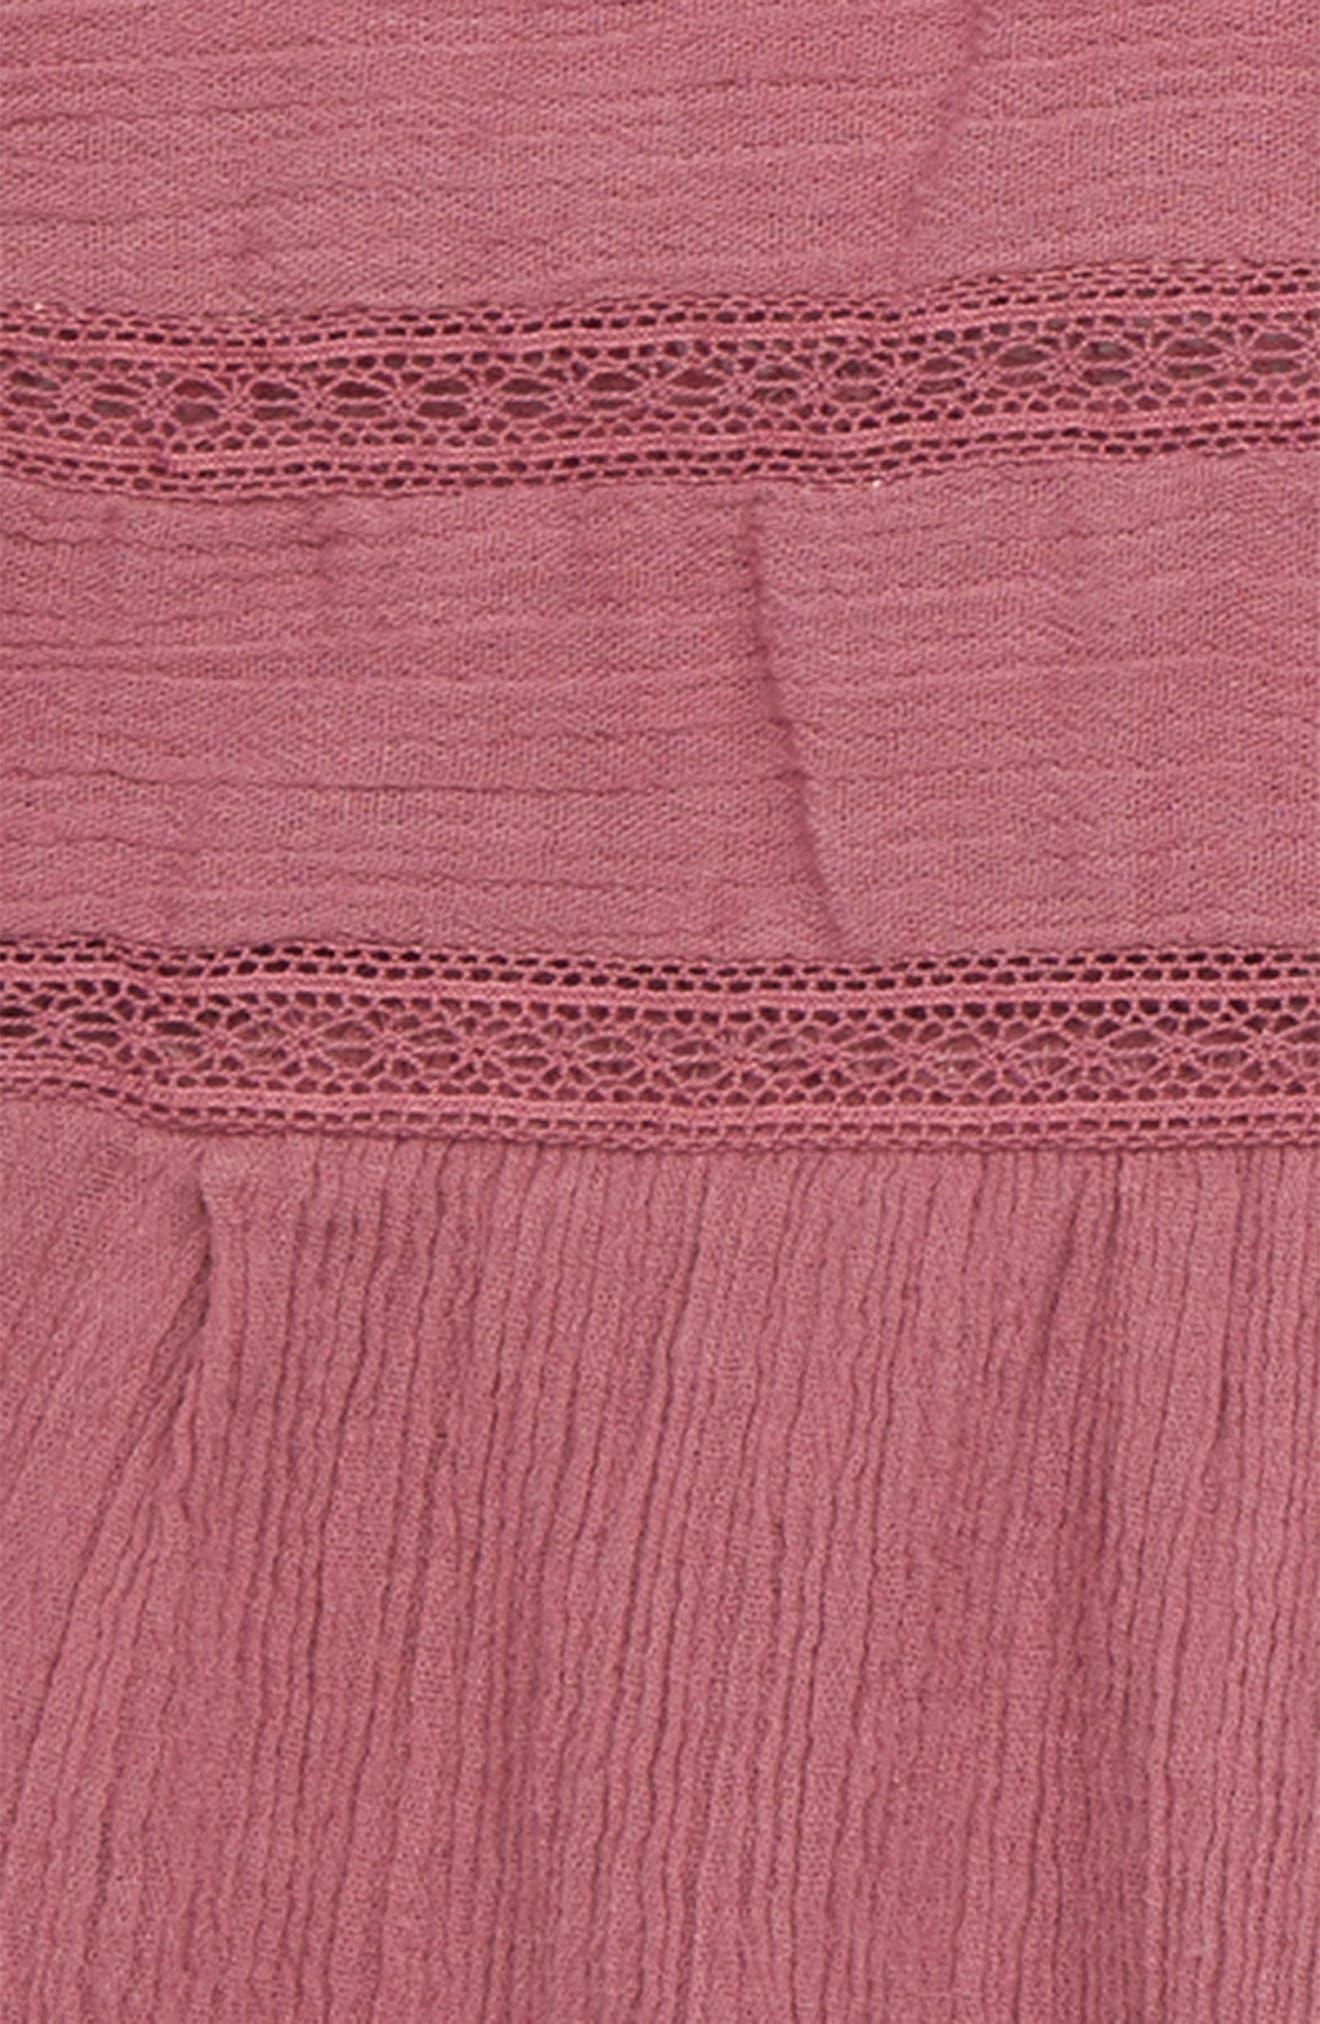 Kensie Crinkle Dress,                             Alternate thumbnail 2, color,                             Mauve